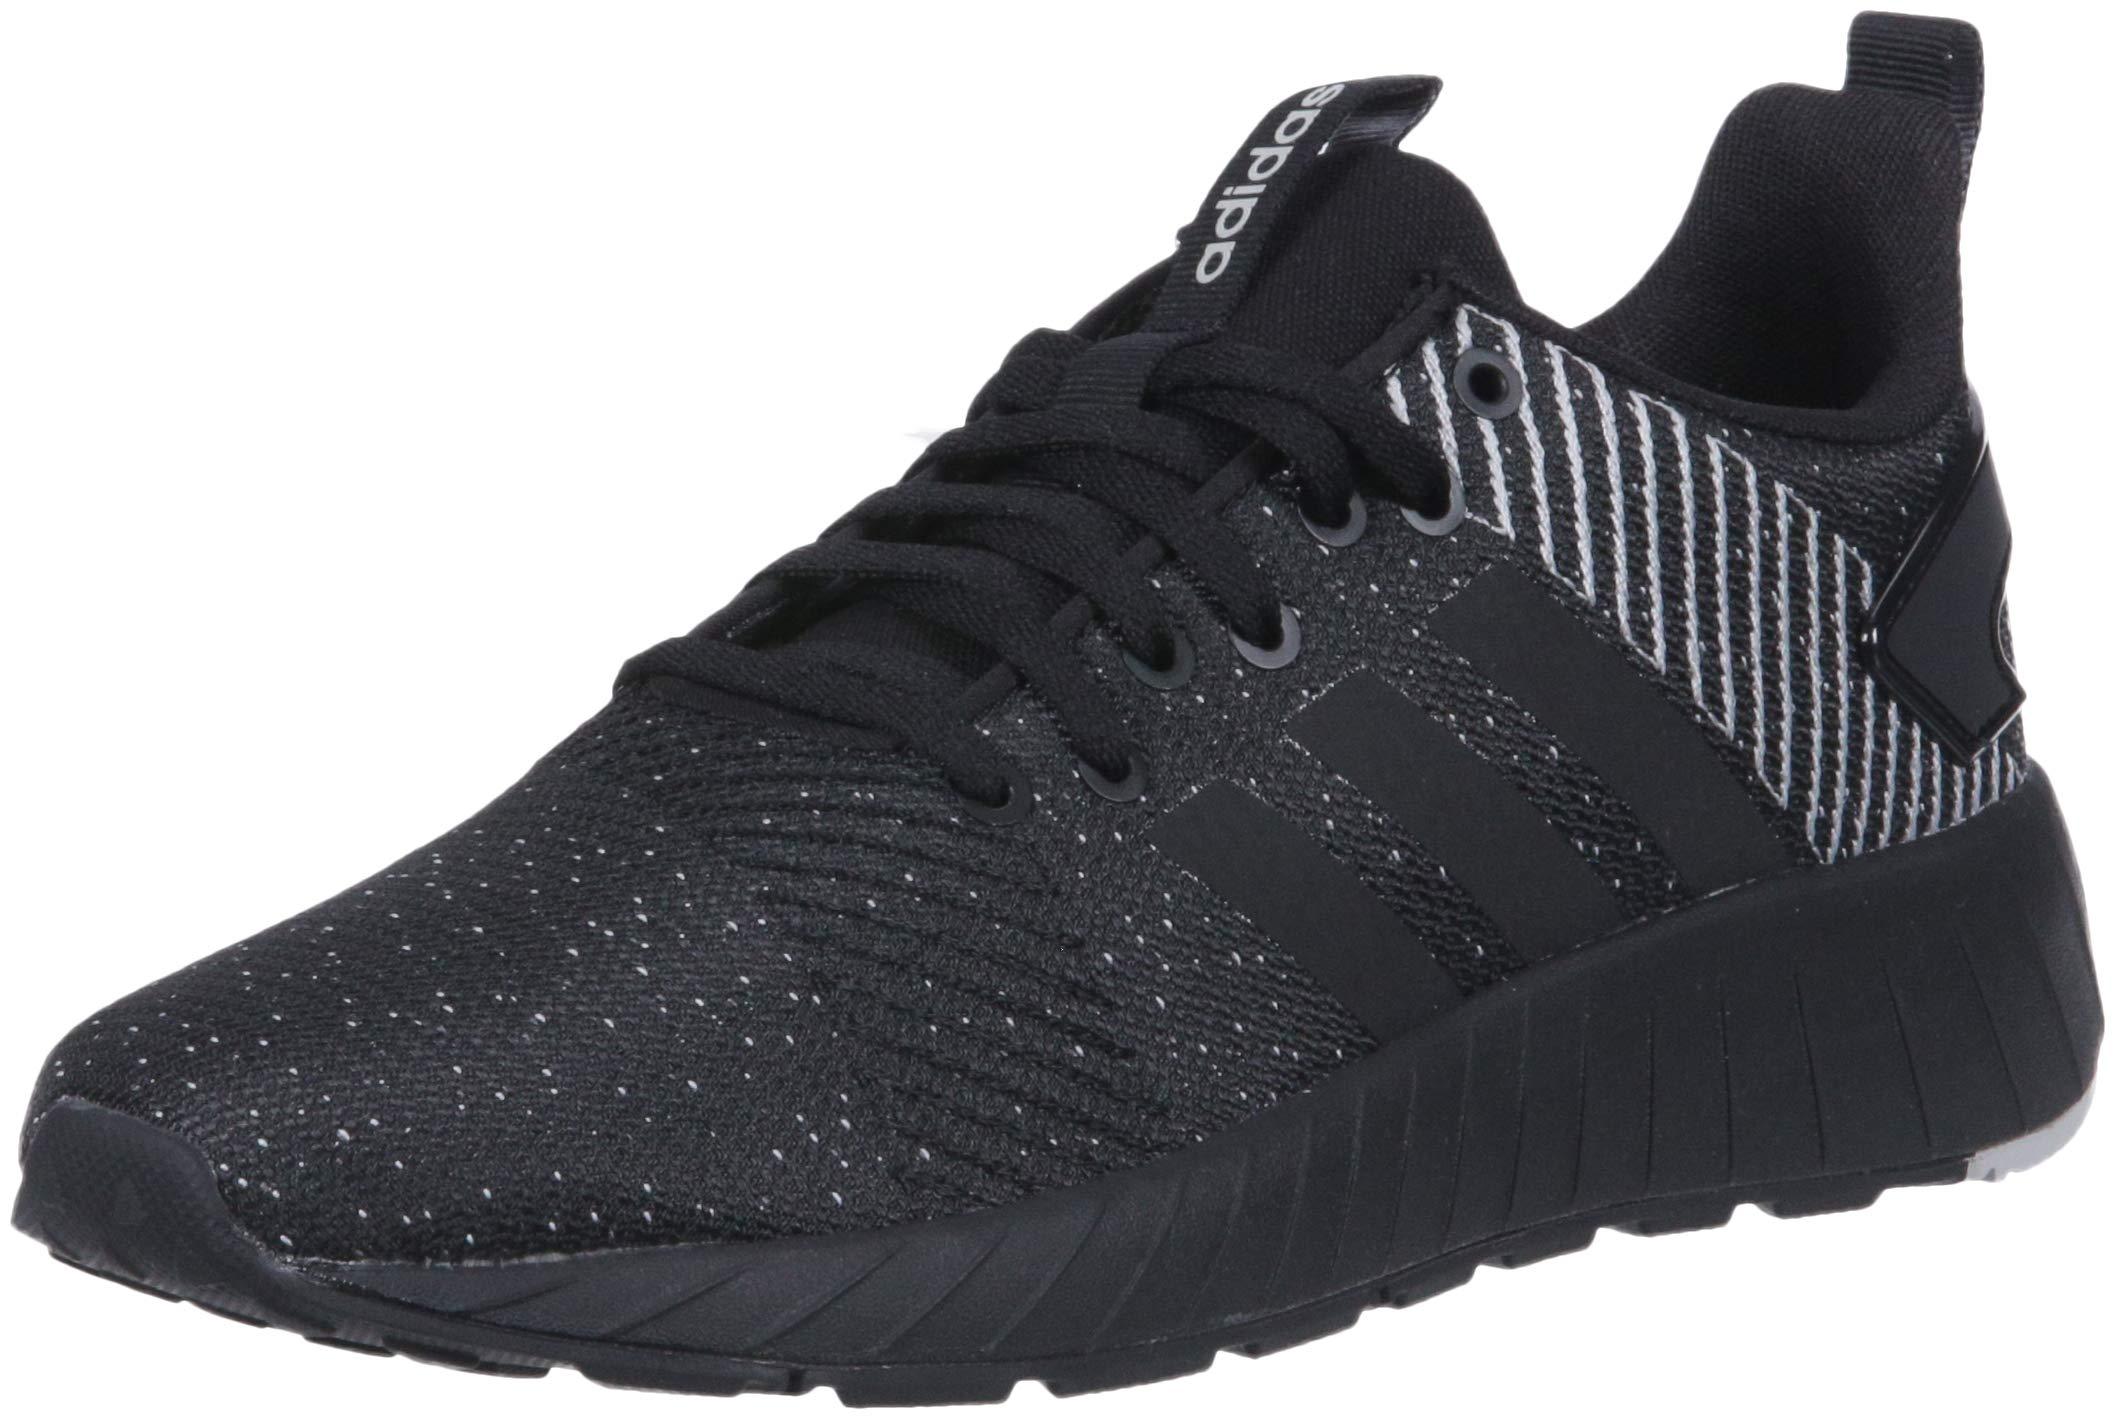 adidas Men's Questar BYD Running Shoe Black/Grey, 6.5 M US by adidas (Image #1)